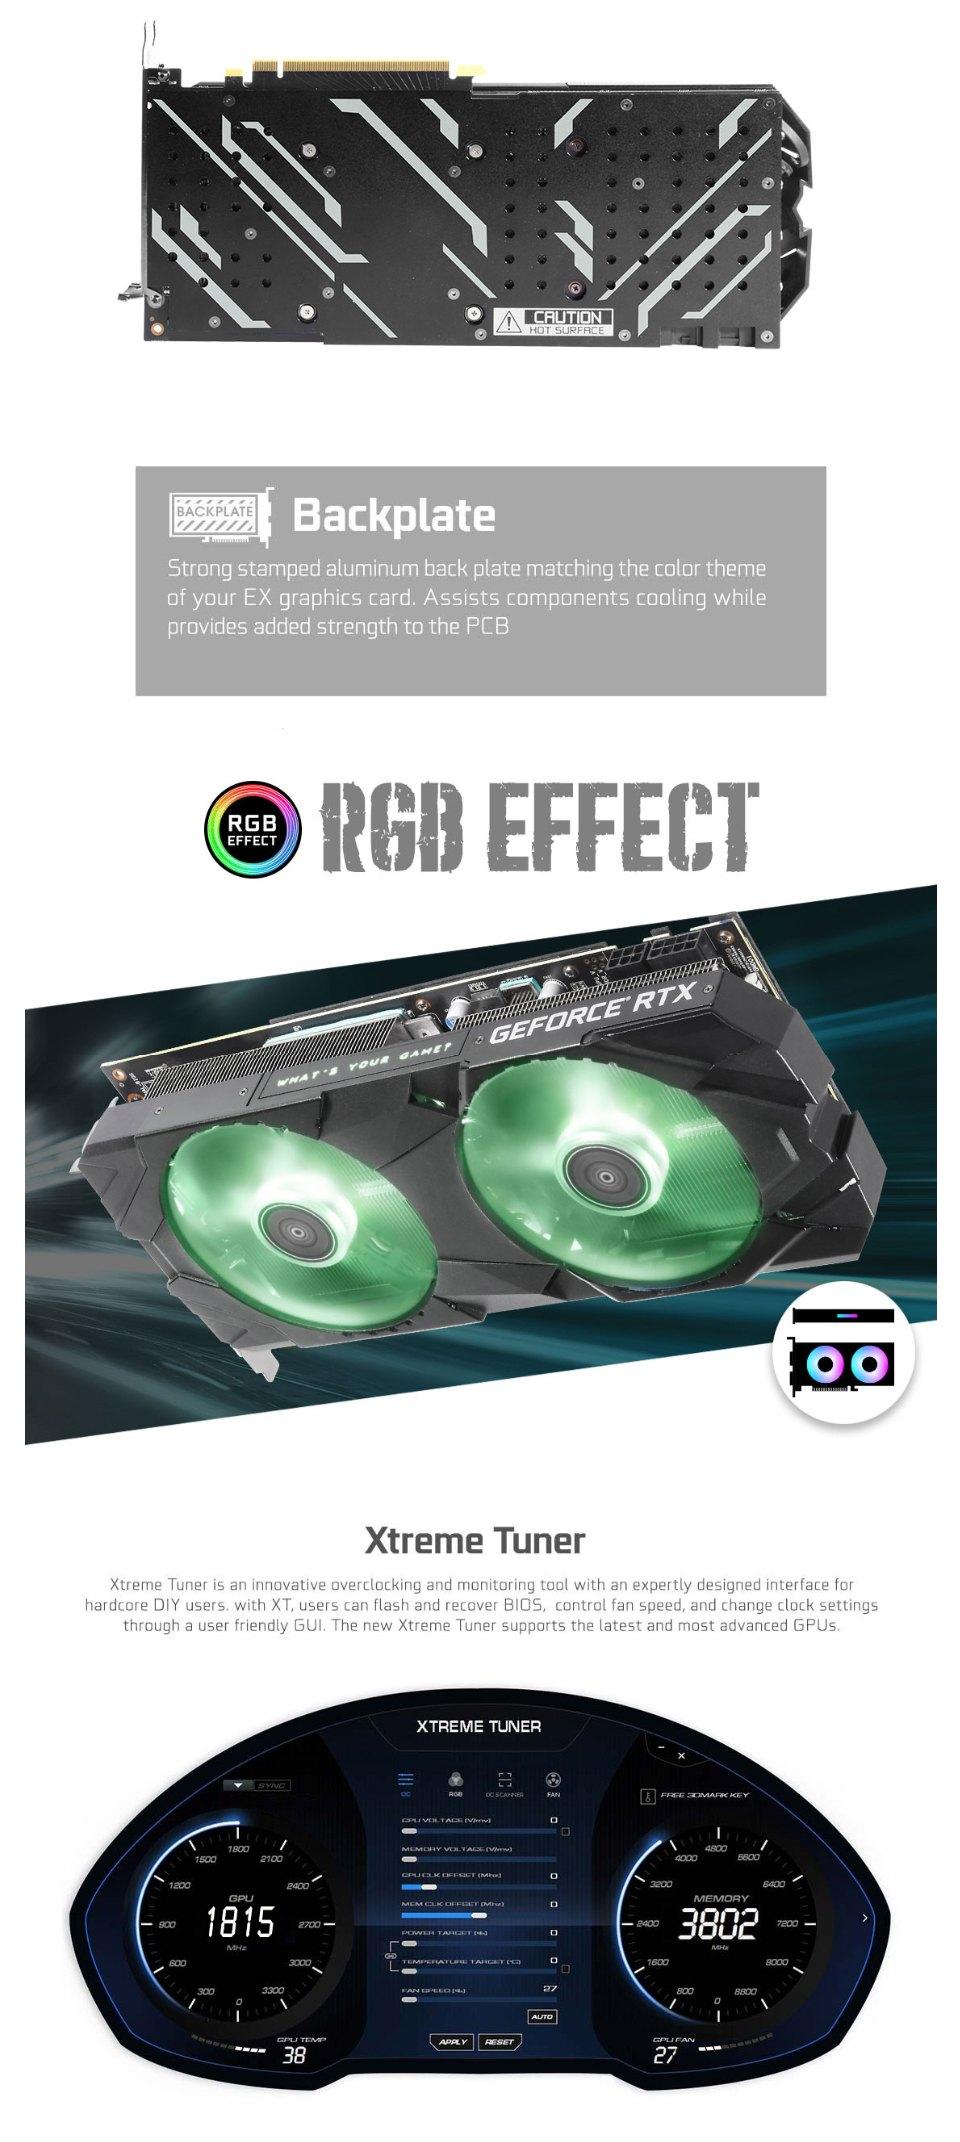 Galax GeForce RTX 2070 Super EX OC 8GB features 2